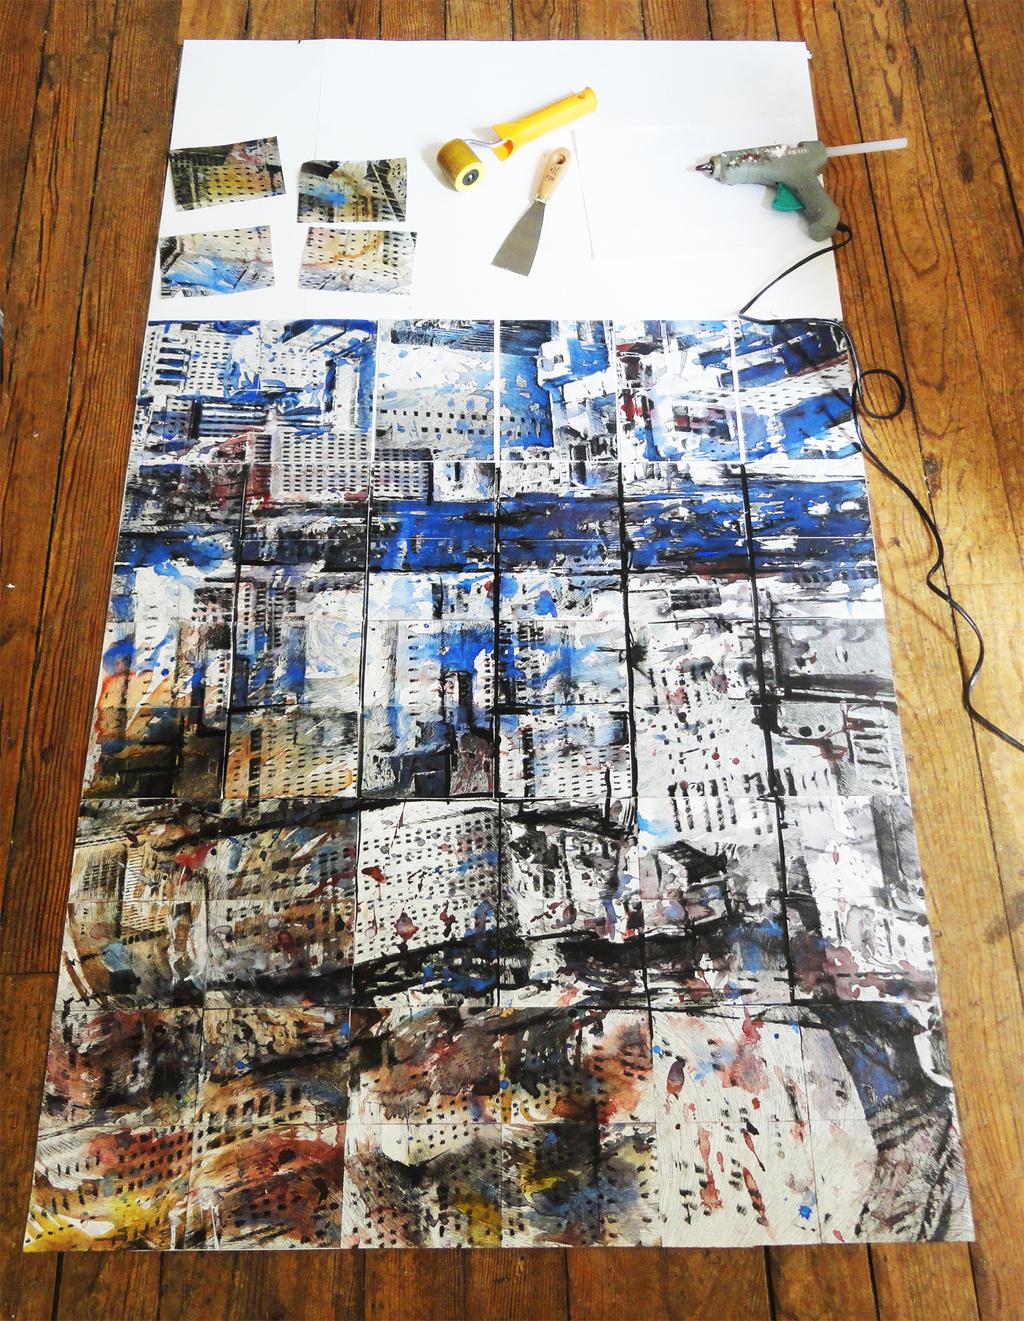 NY Work in progress by nicolasjolly